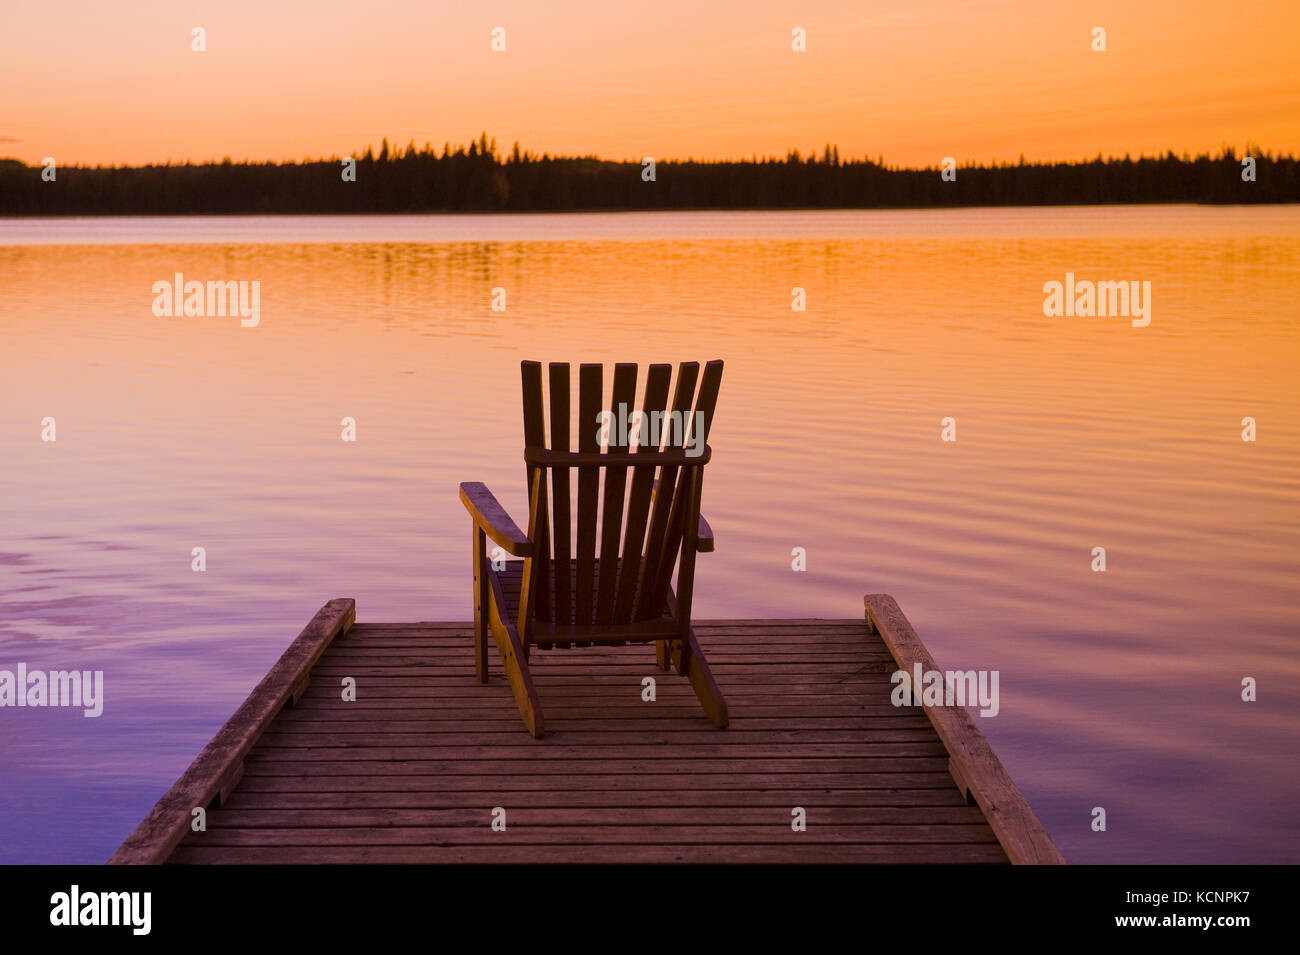 Muskoka Chair auf Dock, schöner See, Duck Mountain Provincial Park, Manitoba, Kanada Stockbild